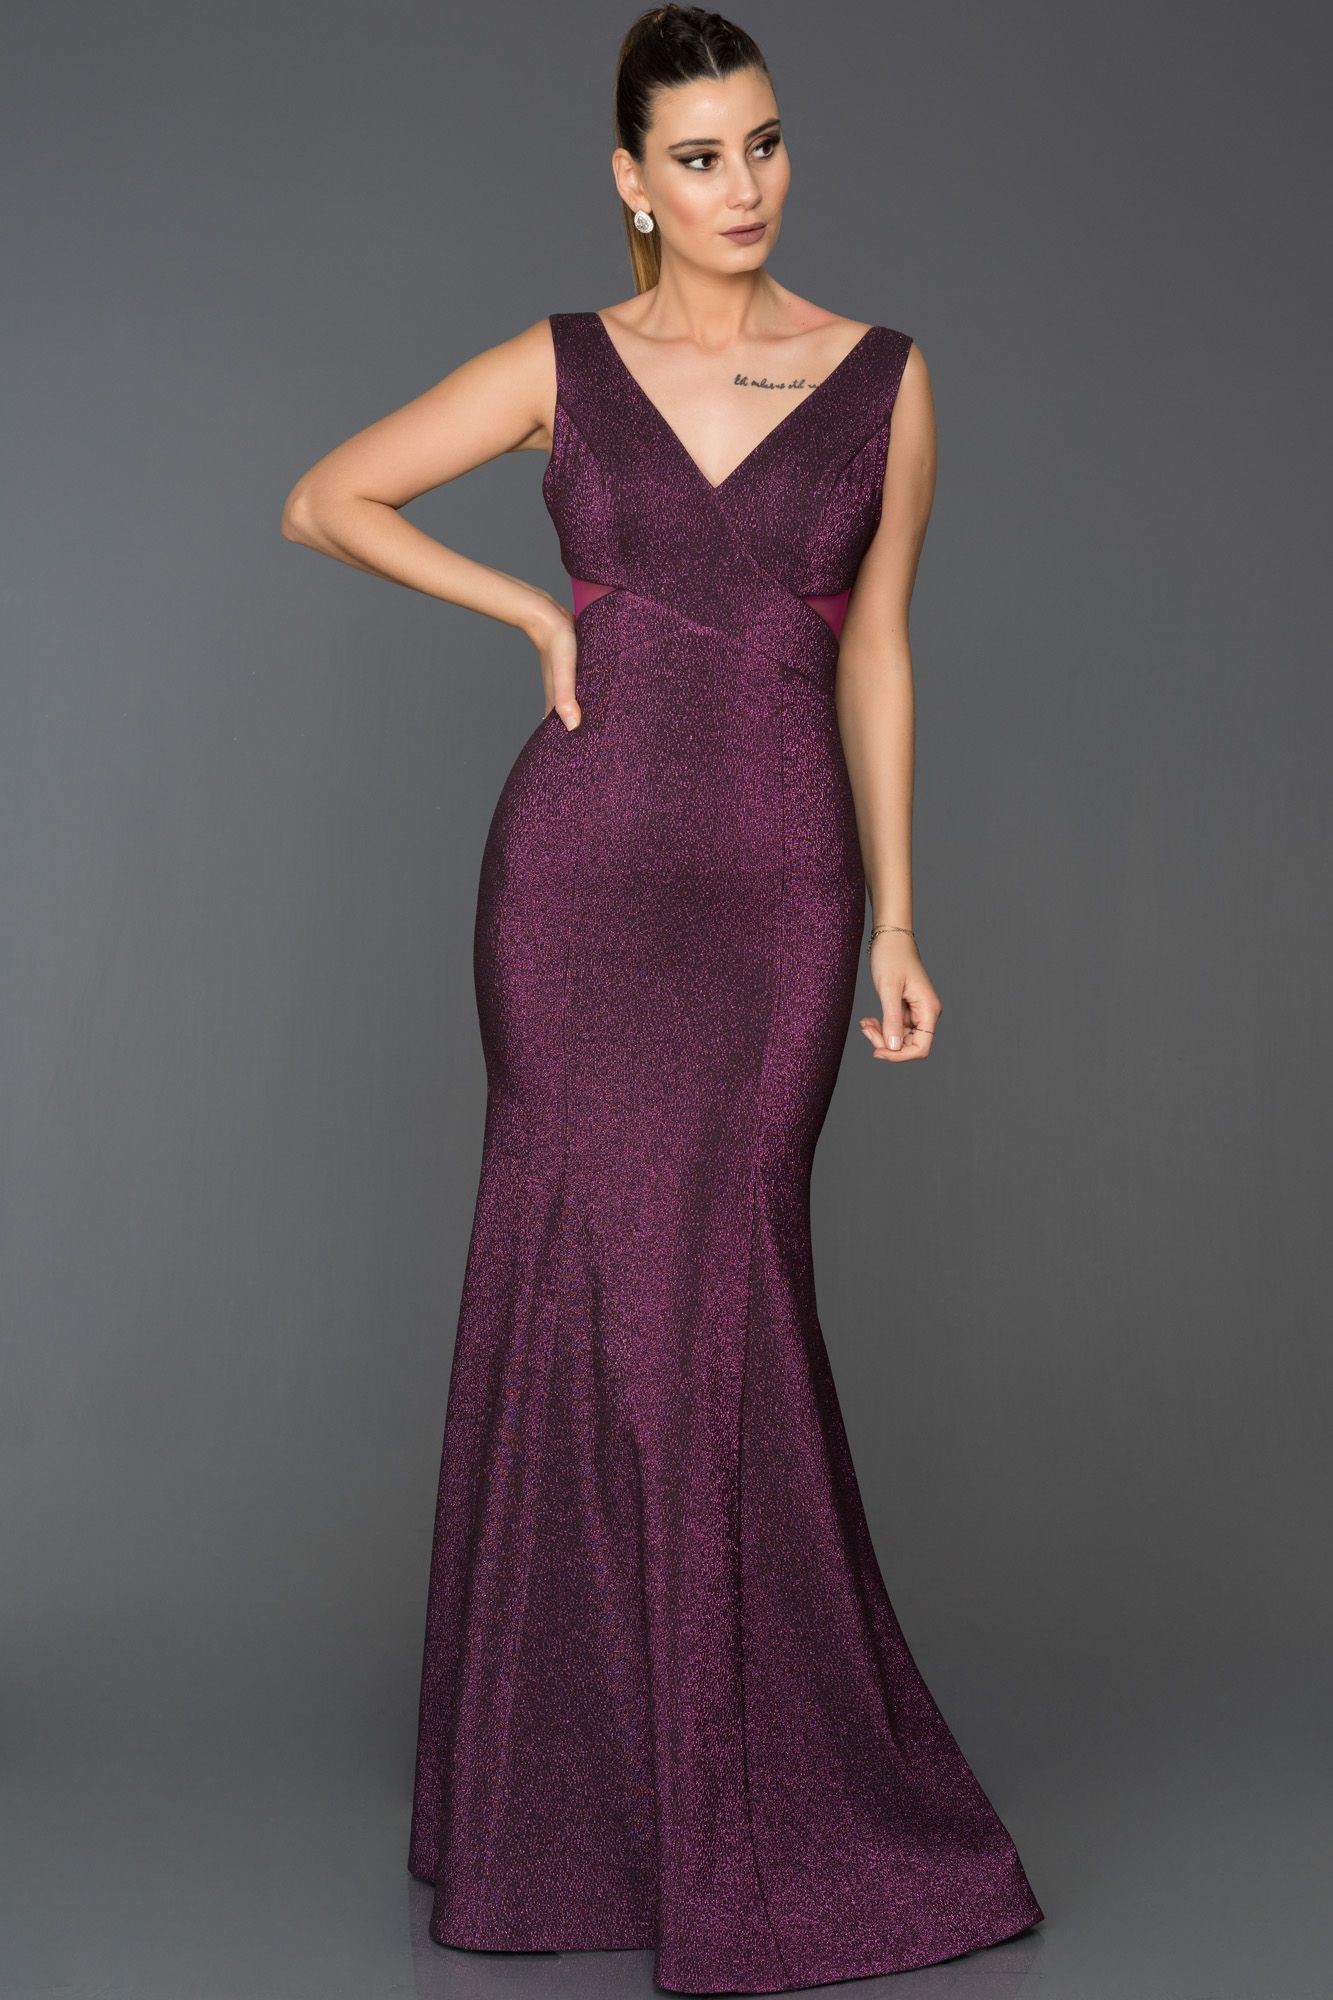 Fusya V Yaka Simli Balik Abiye Abu313 Resmi Elbise The Dress V Yaka